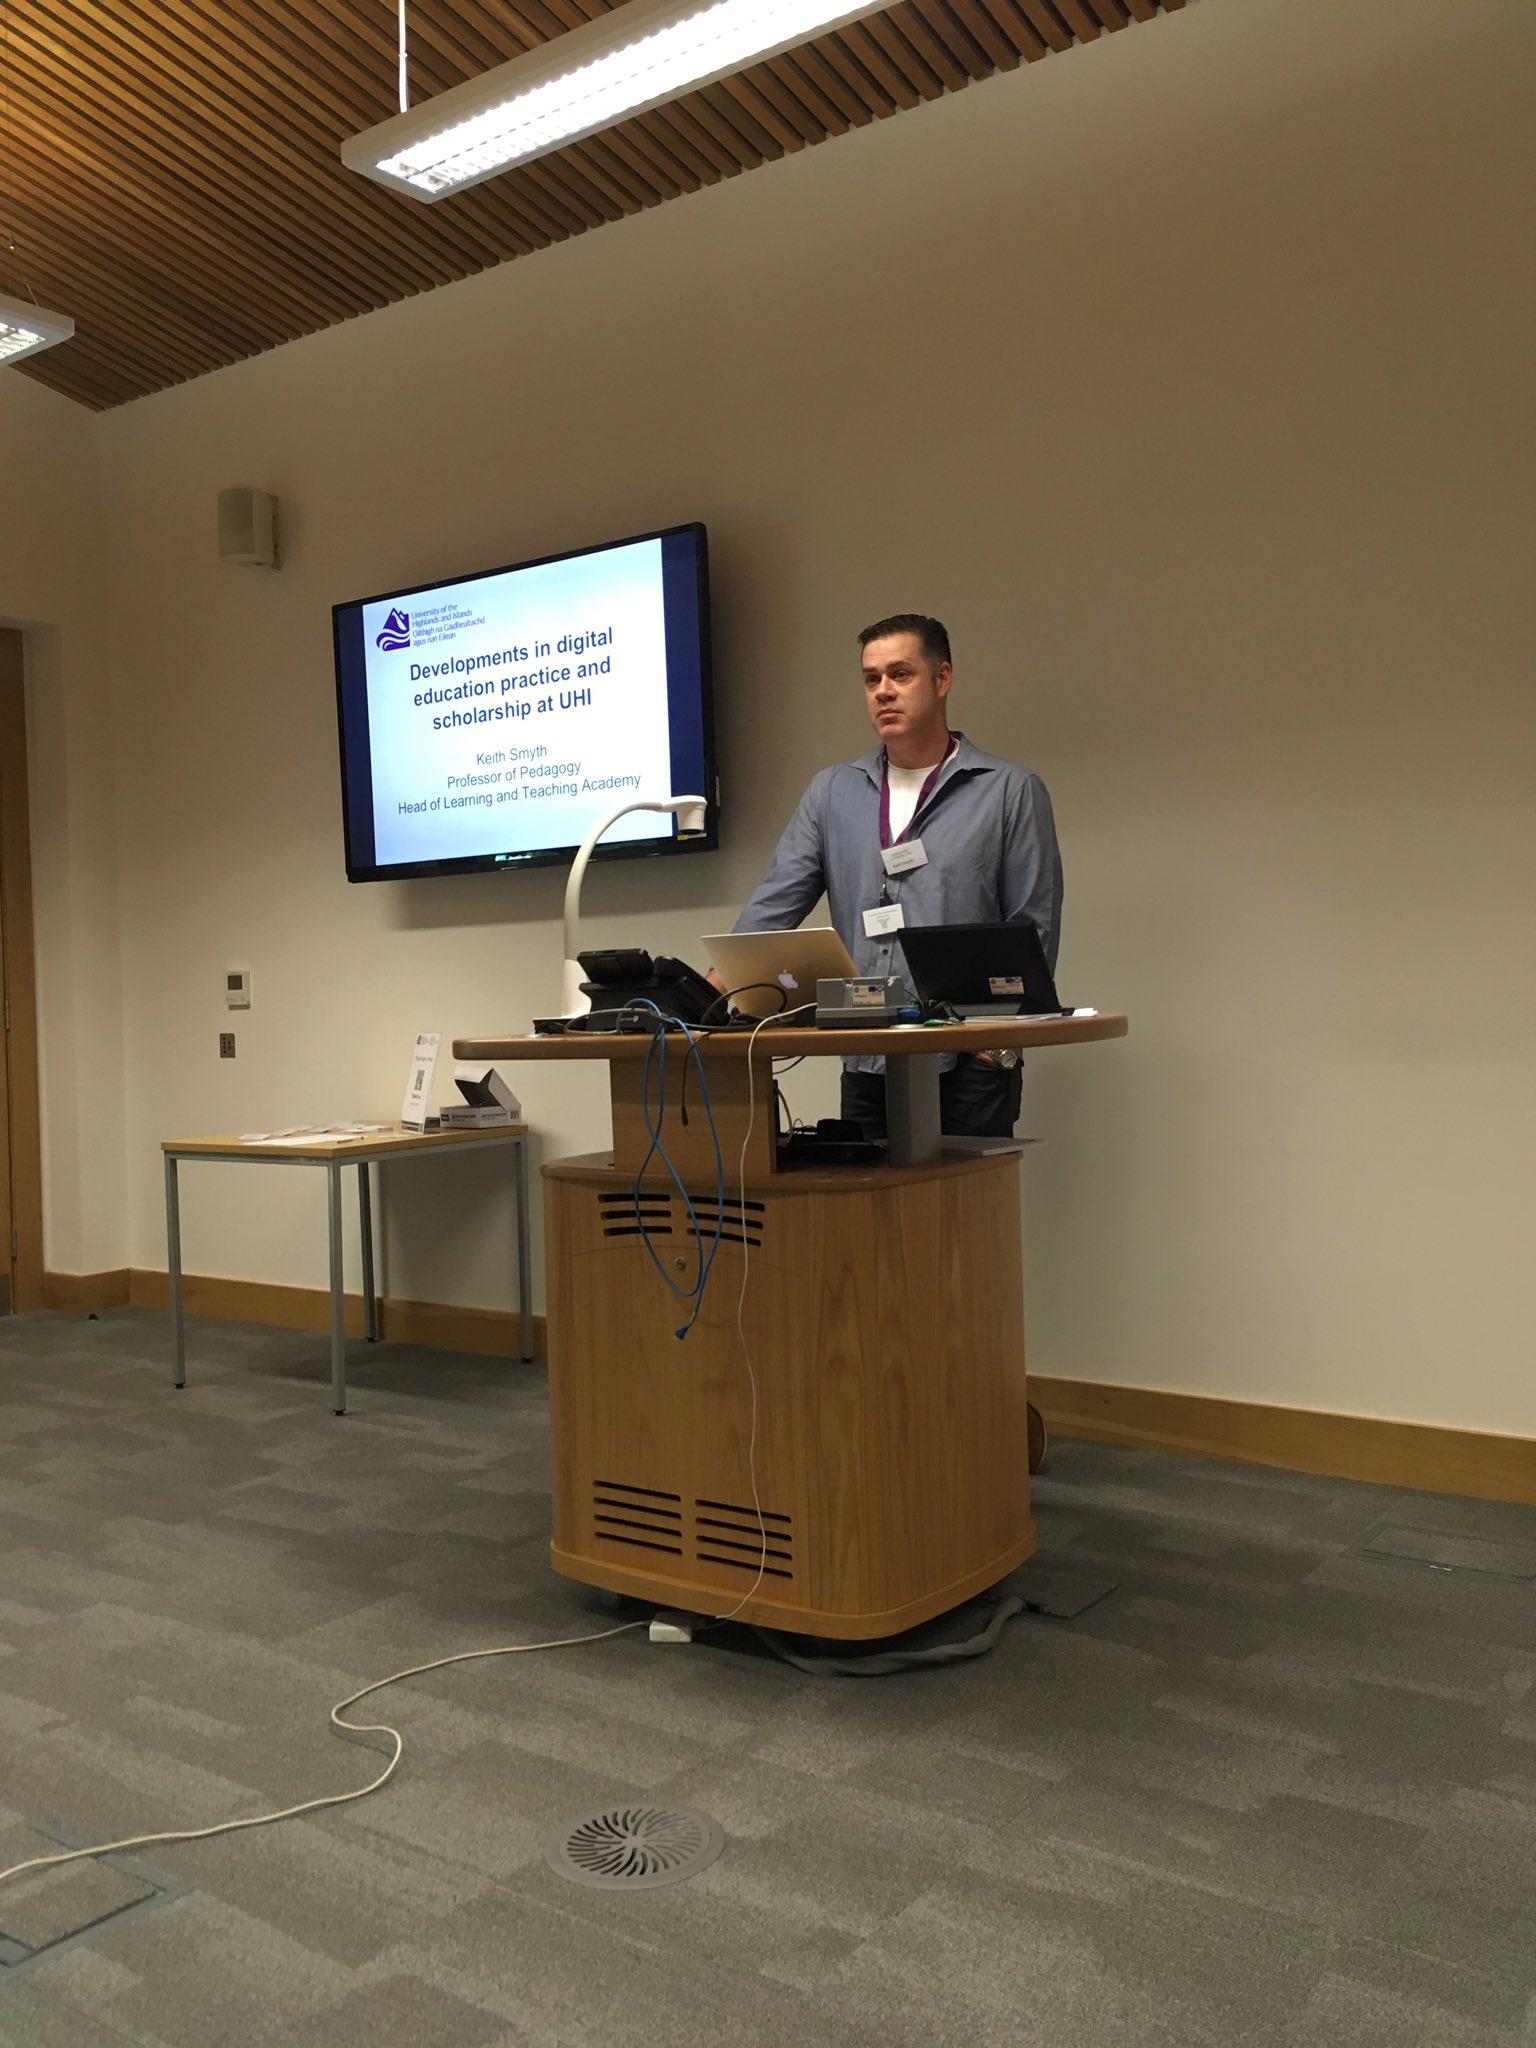 Keith Smyth @smythkrs talking about developments in digital education practice at @LTA_UHI #elesig https://t.co/OMmlQlVo8G